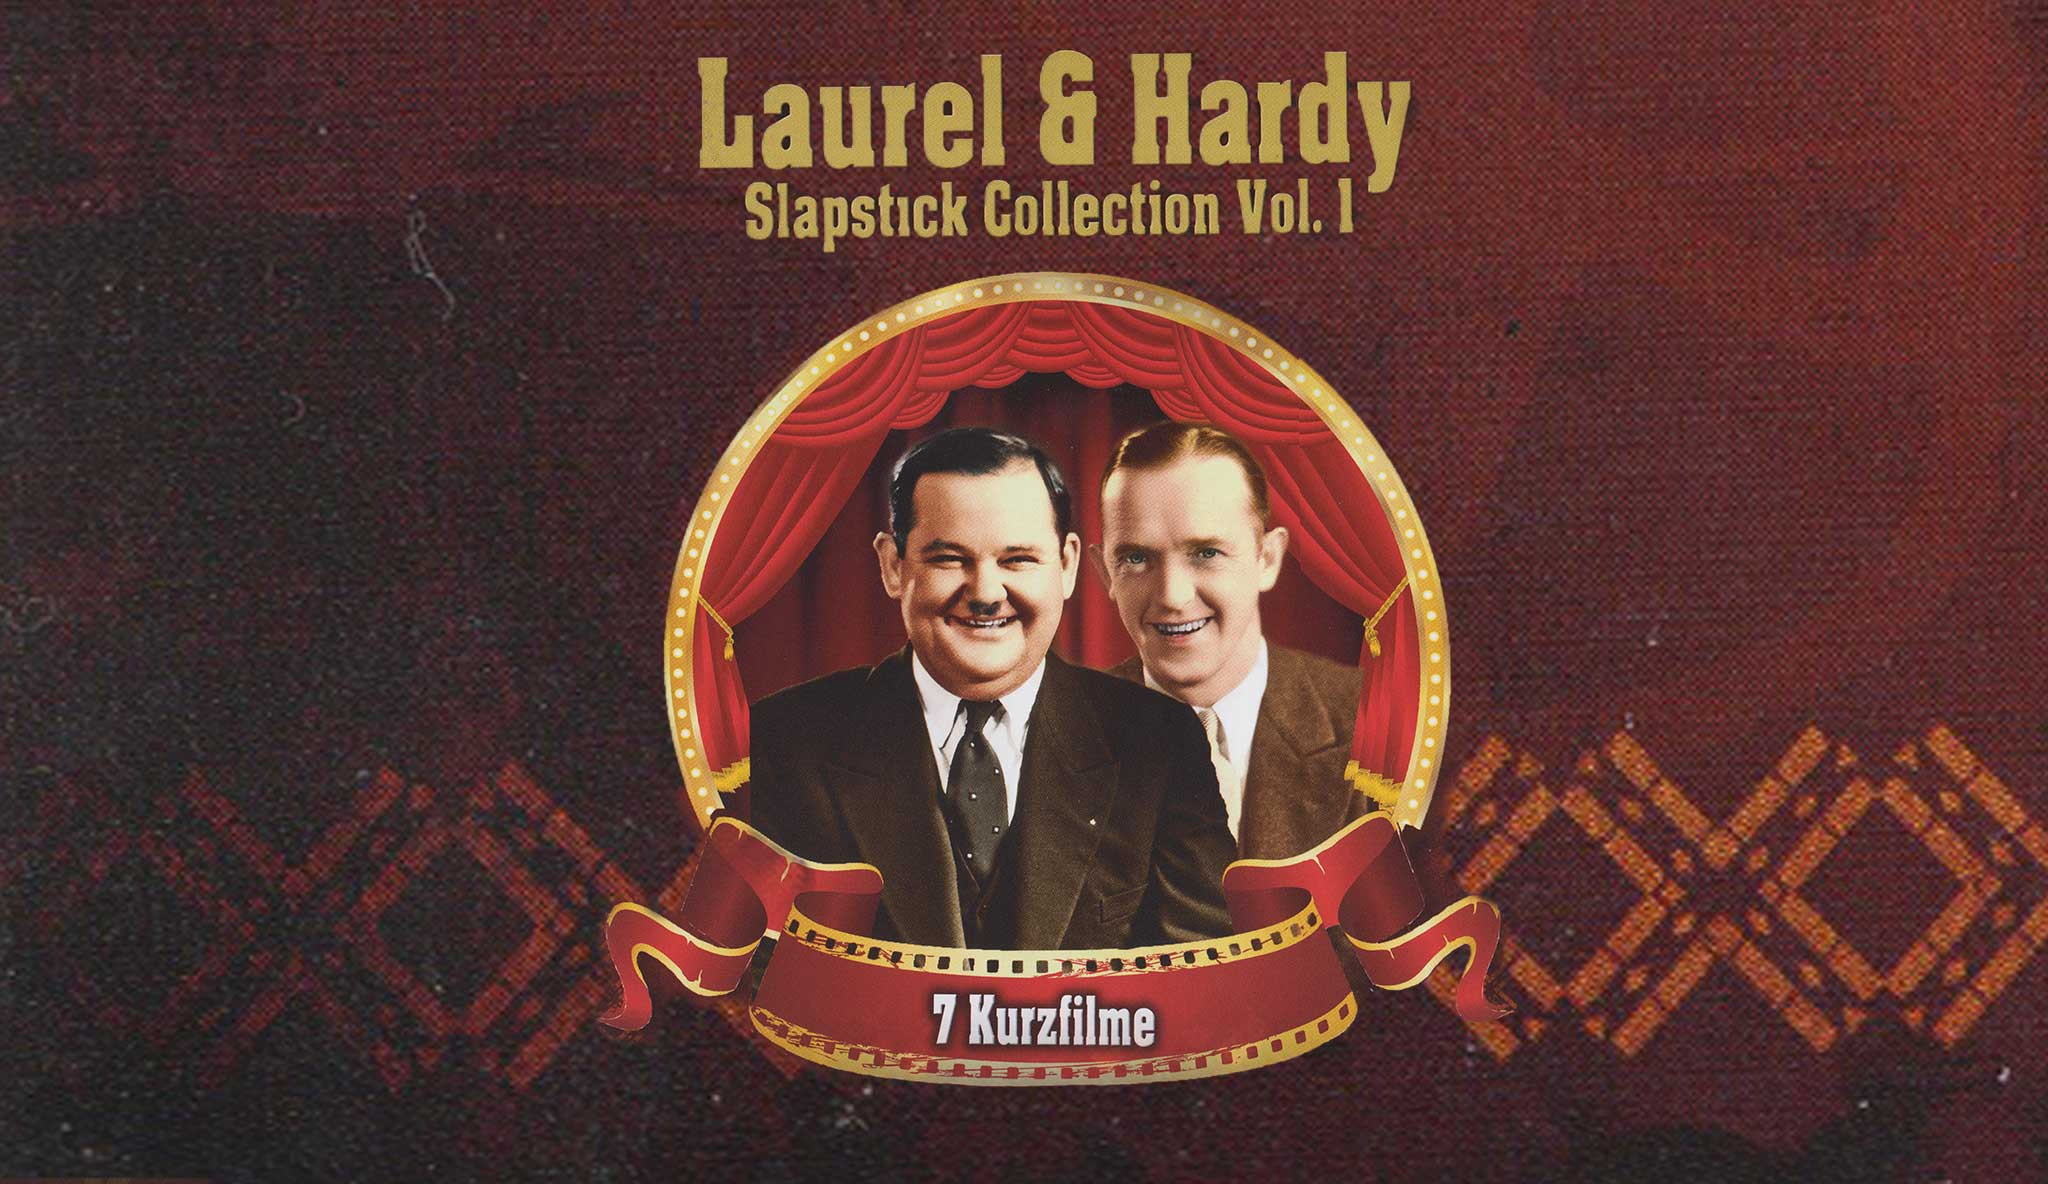 laurel-hardy-slapstick-collection-vol-1\header.jpg